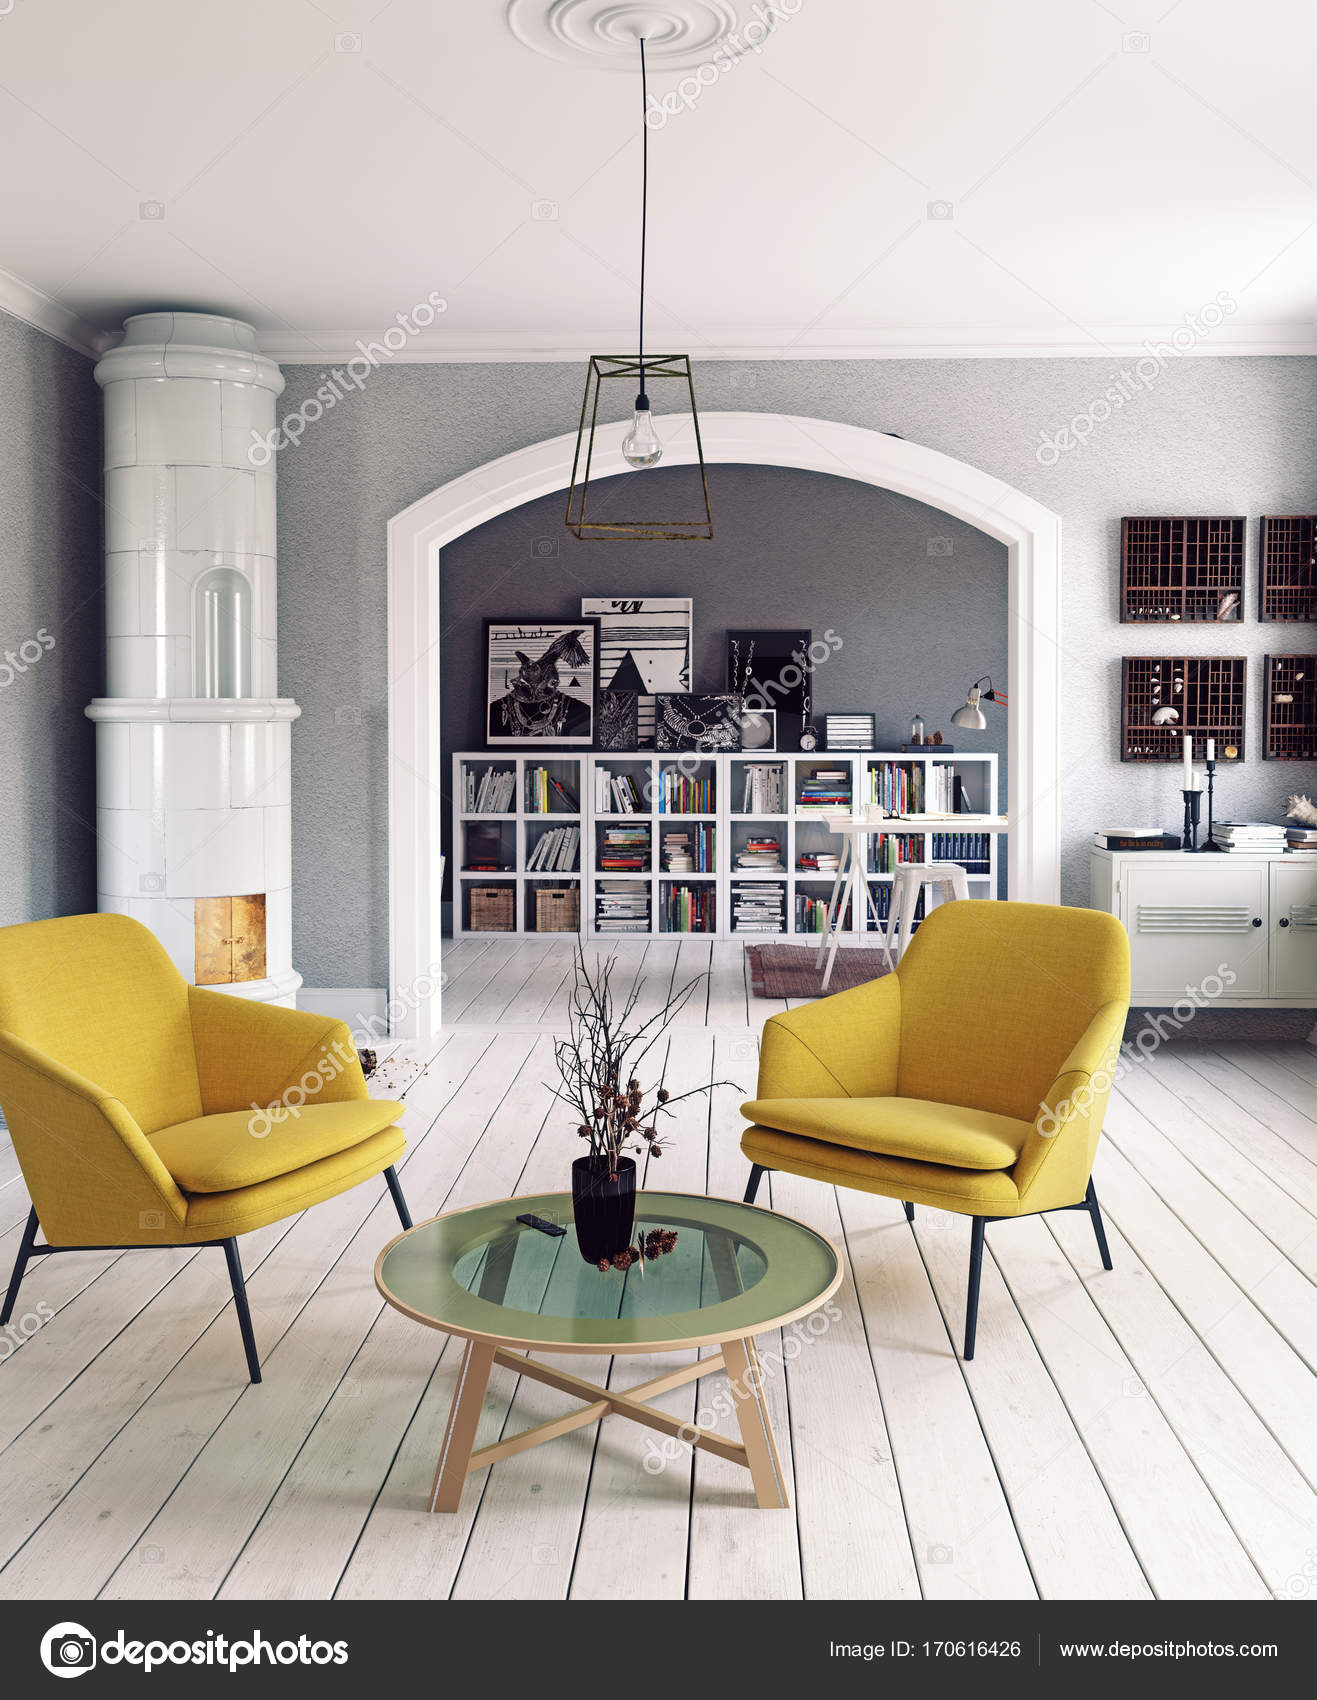 Skandinavisches Design-Interieur — Stockfoto © vicnt2815 #170616426